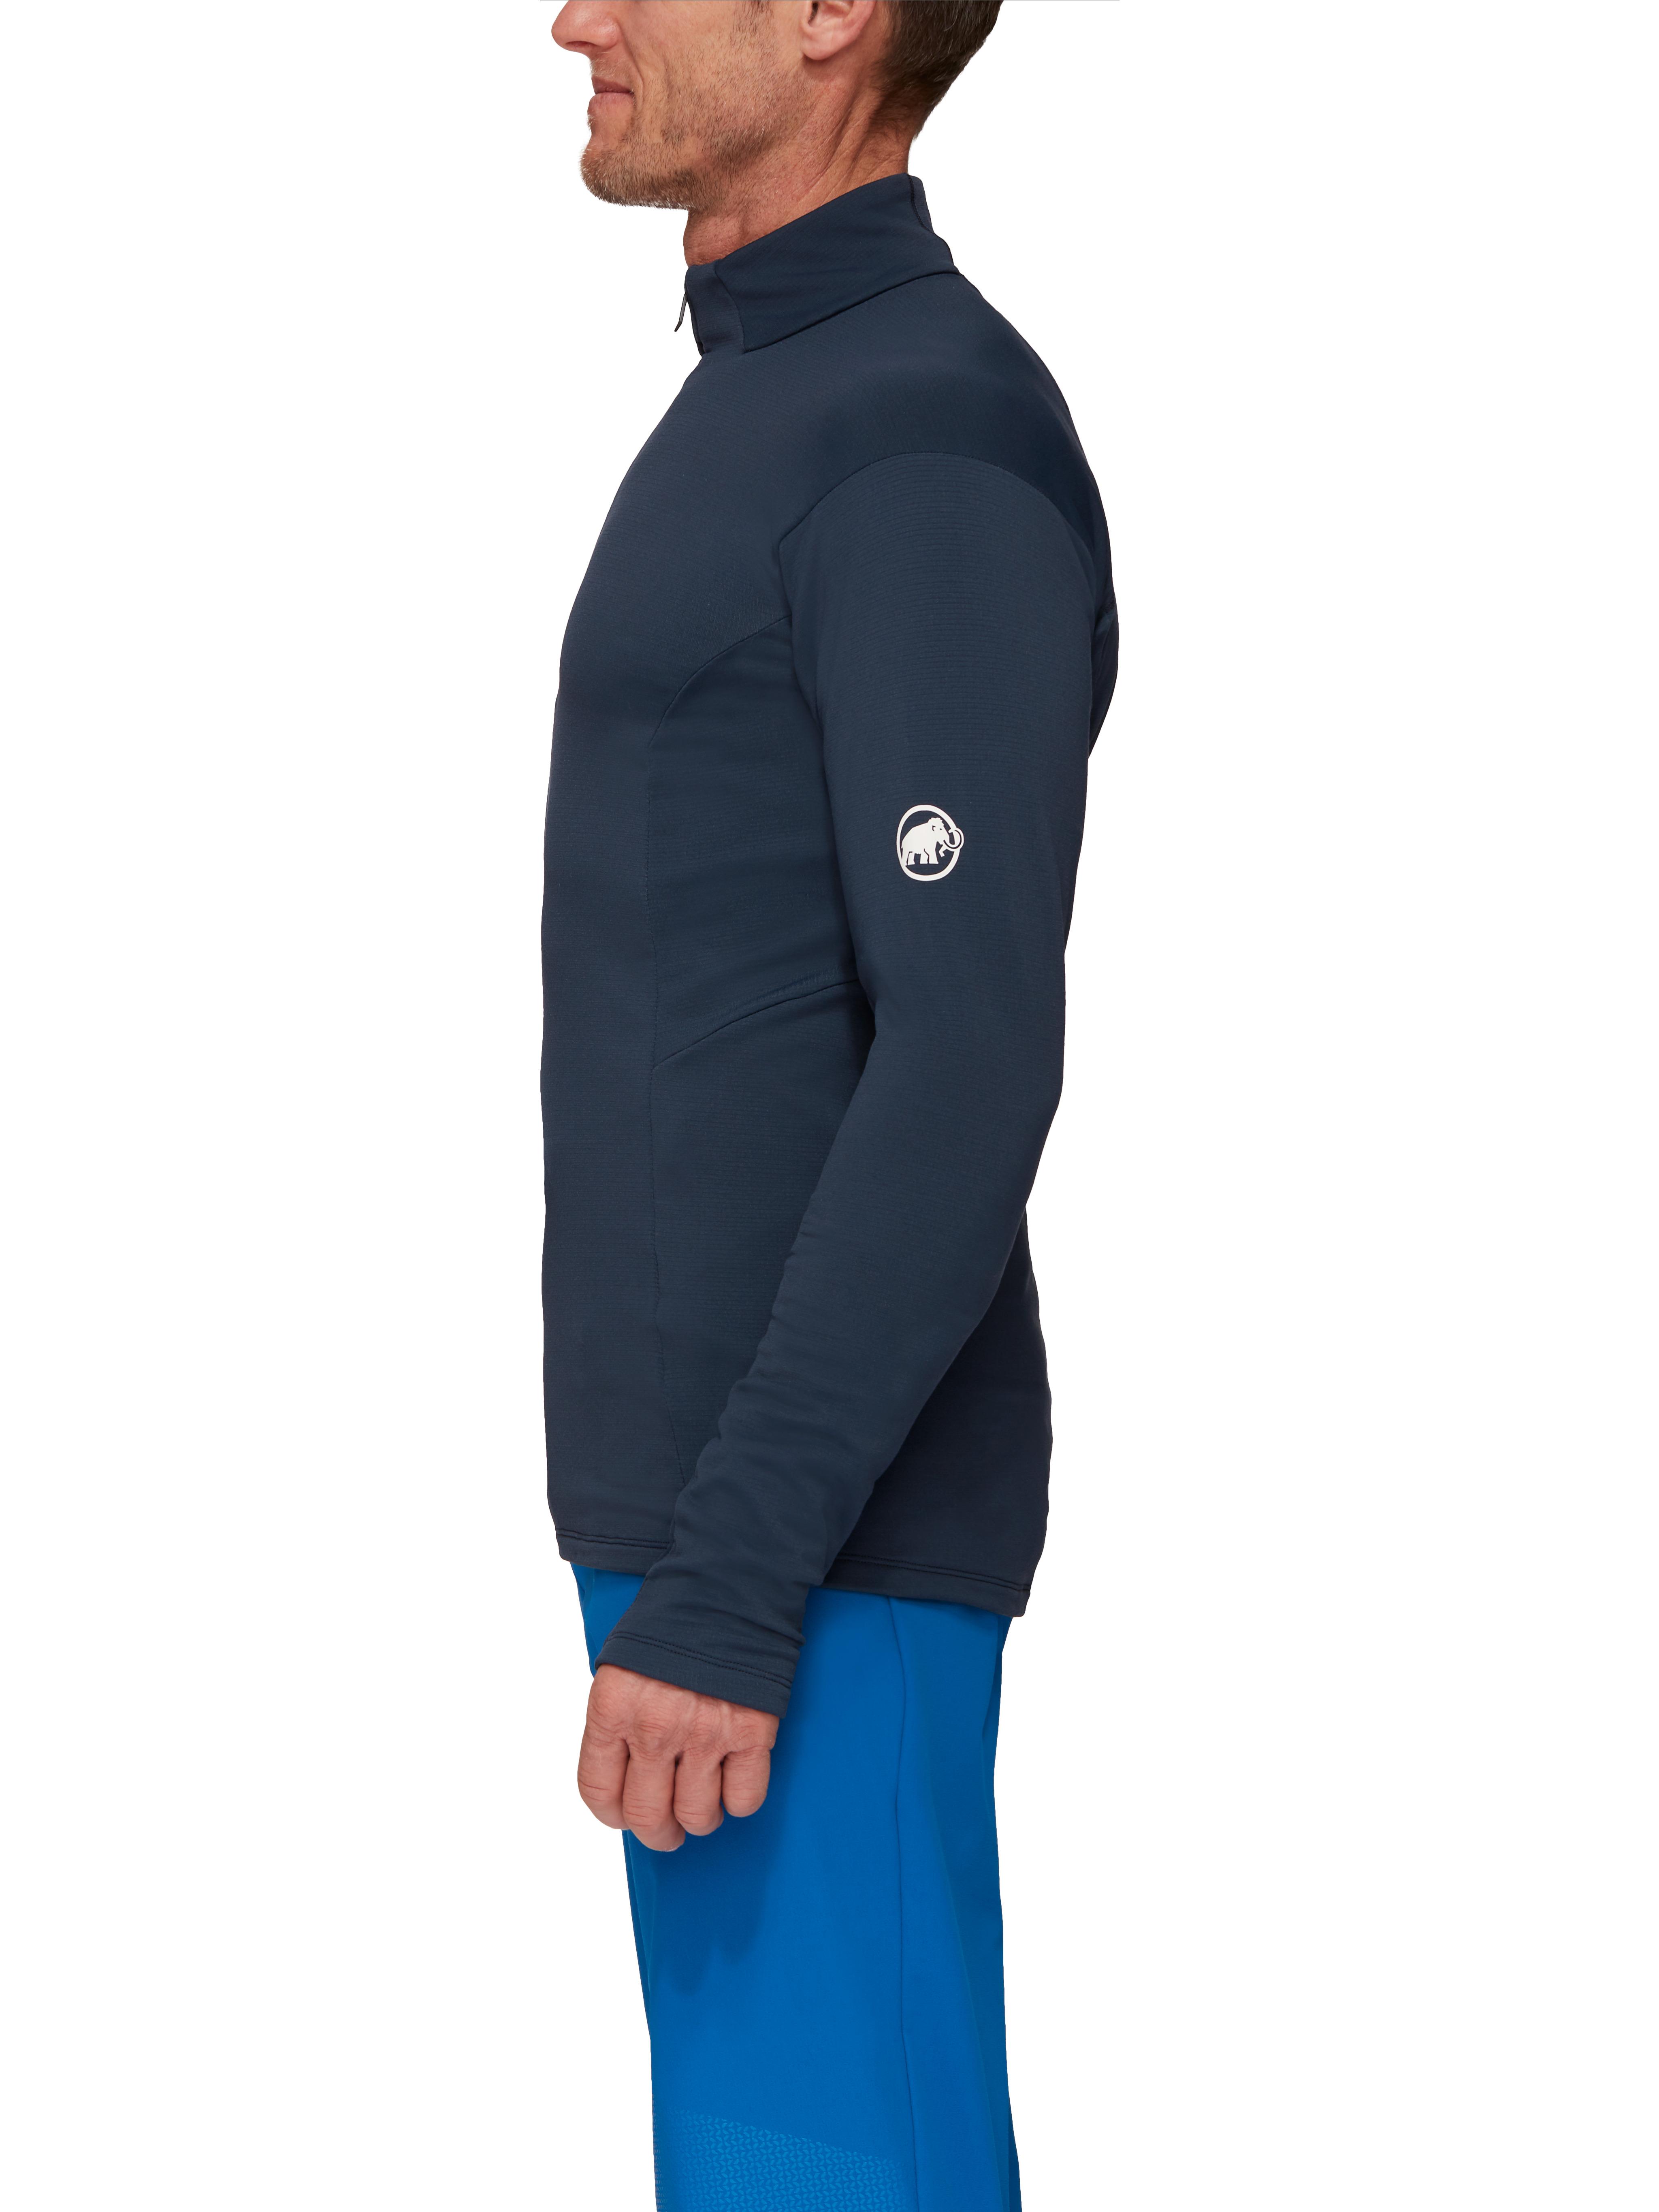 Moench Advanced Half Zip Longsleeve Men product image